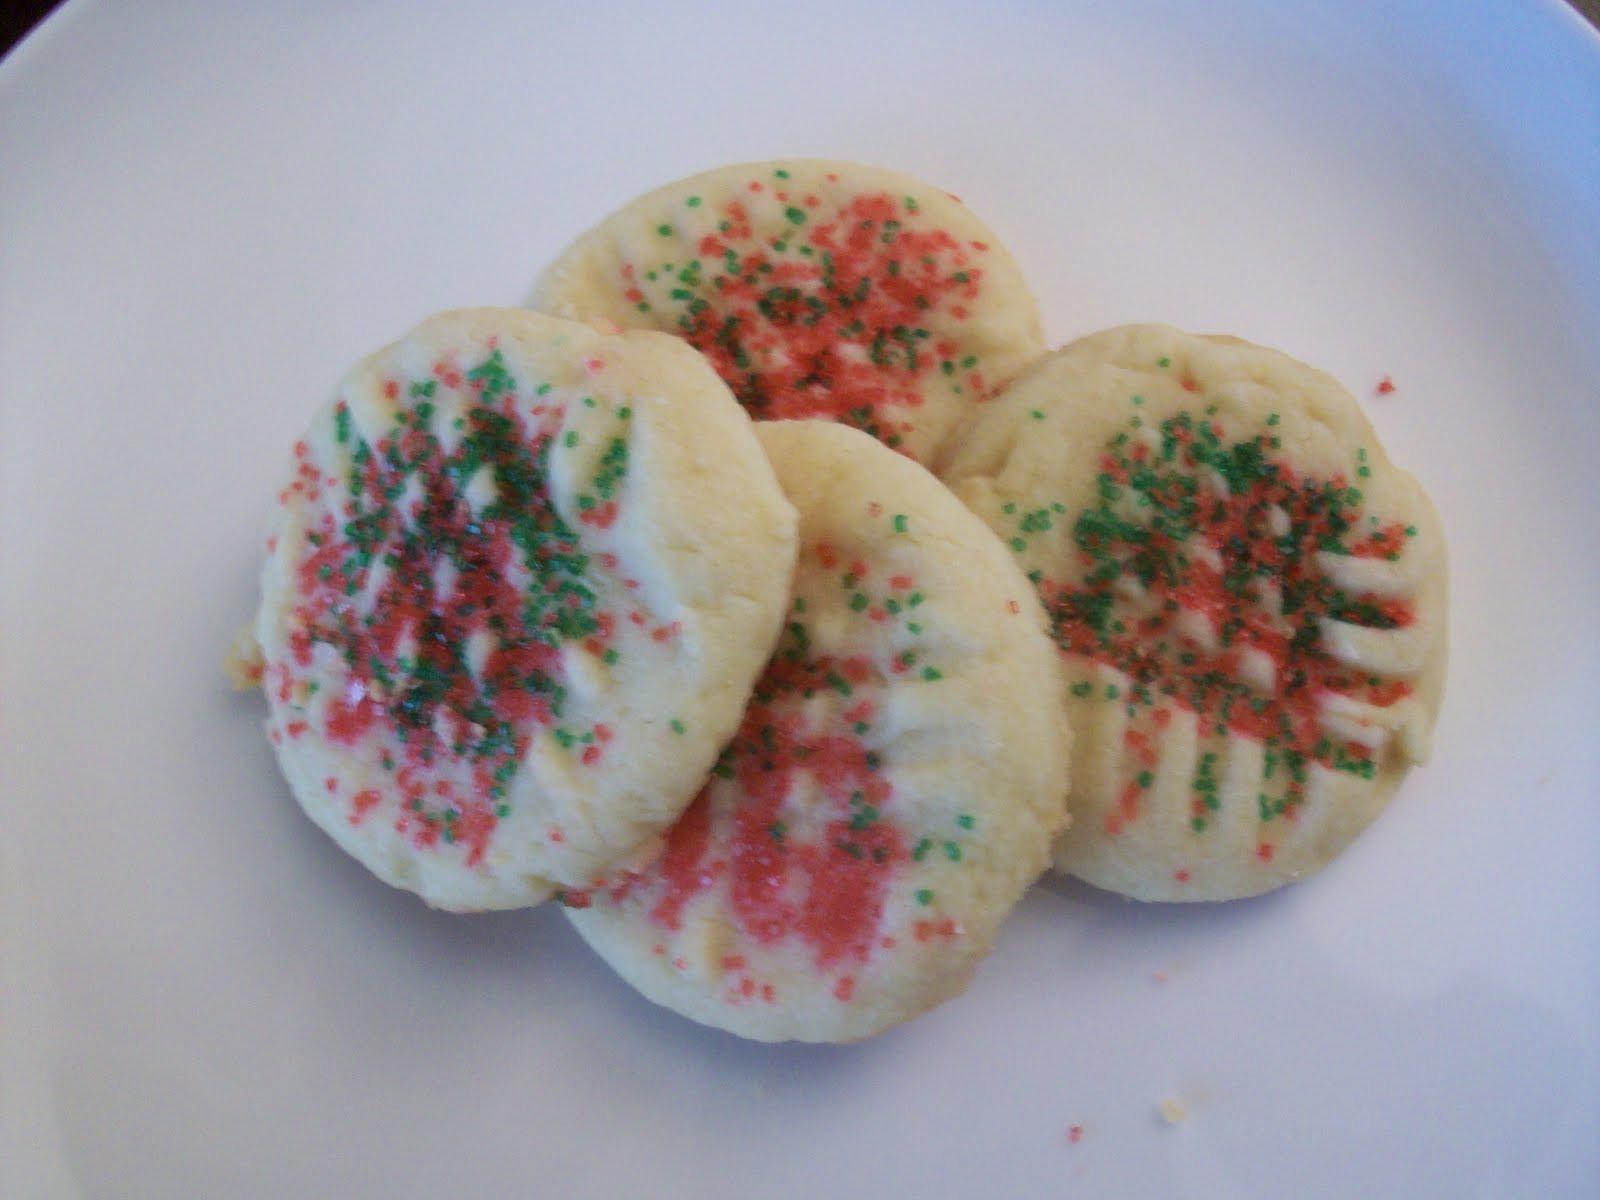 Nut Free Christmas Cookies  The Nut Free Mom Blog Peanut Allergy Nut Free Christmas